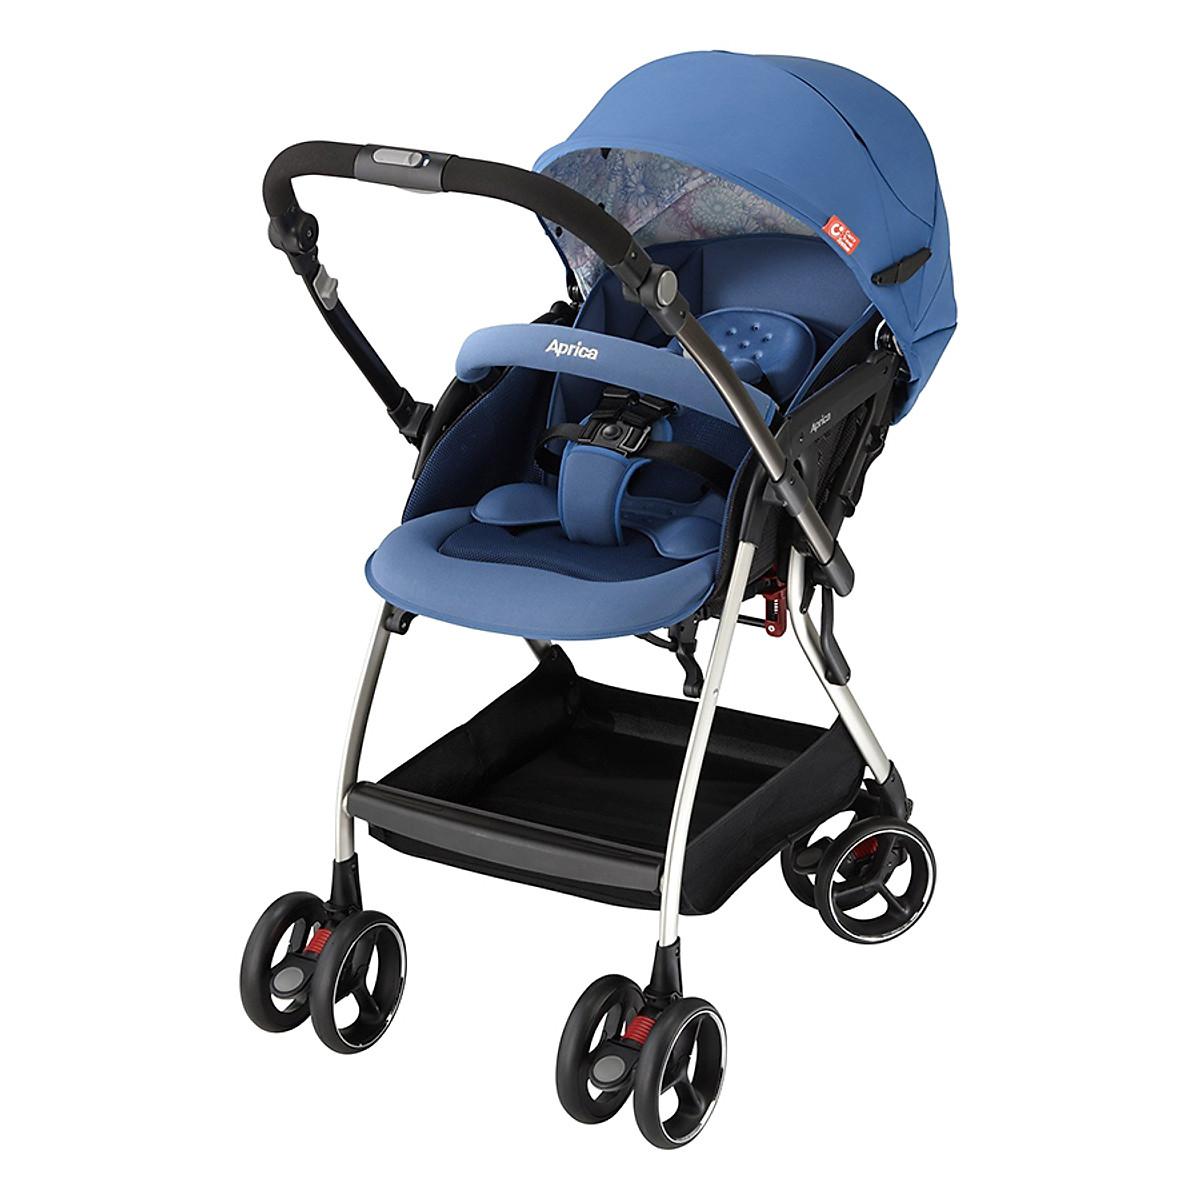 Xe đẩy trẻ em Aprica Optia CTS Blue